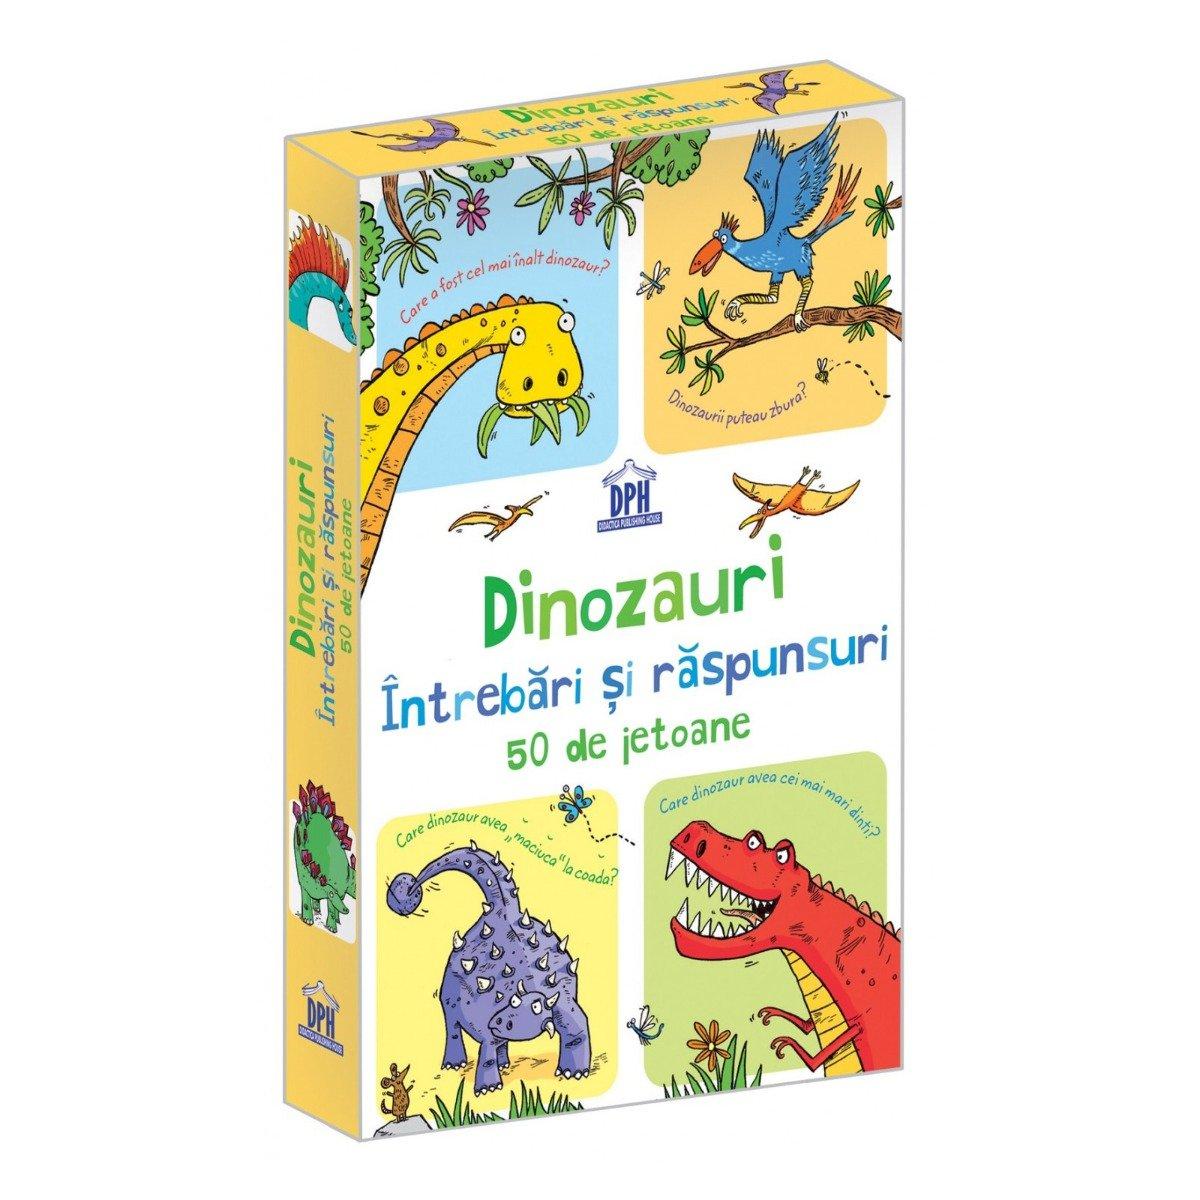 Dinozauri, Intrebari si raspunsuri, 50 jetoane, Editura DPH